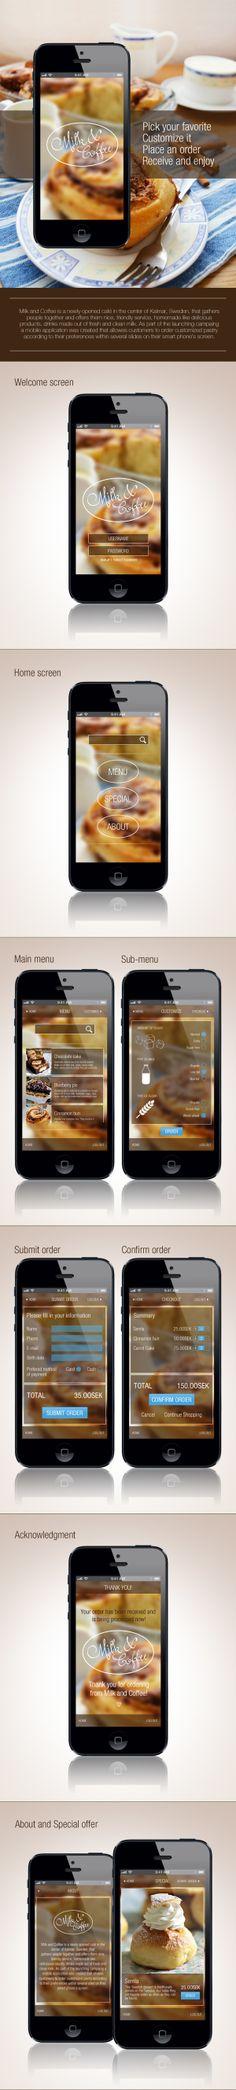 Mobile Application for a coffee shop by Eva Peycheva, via Behance